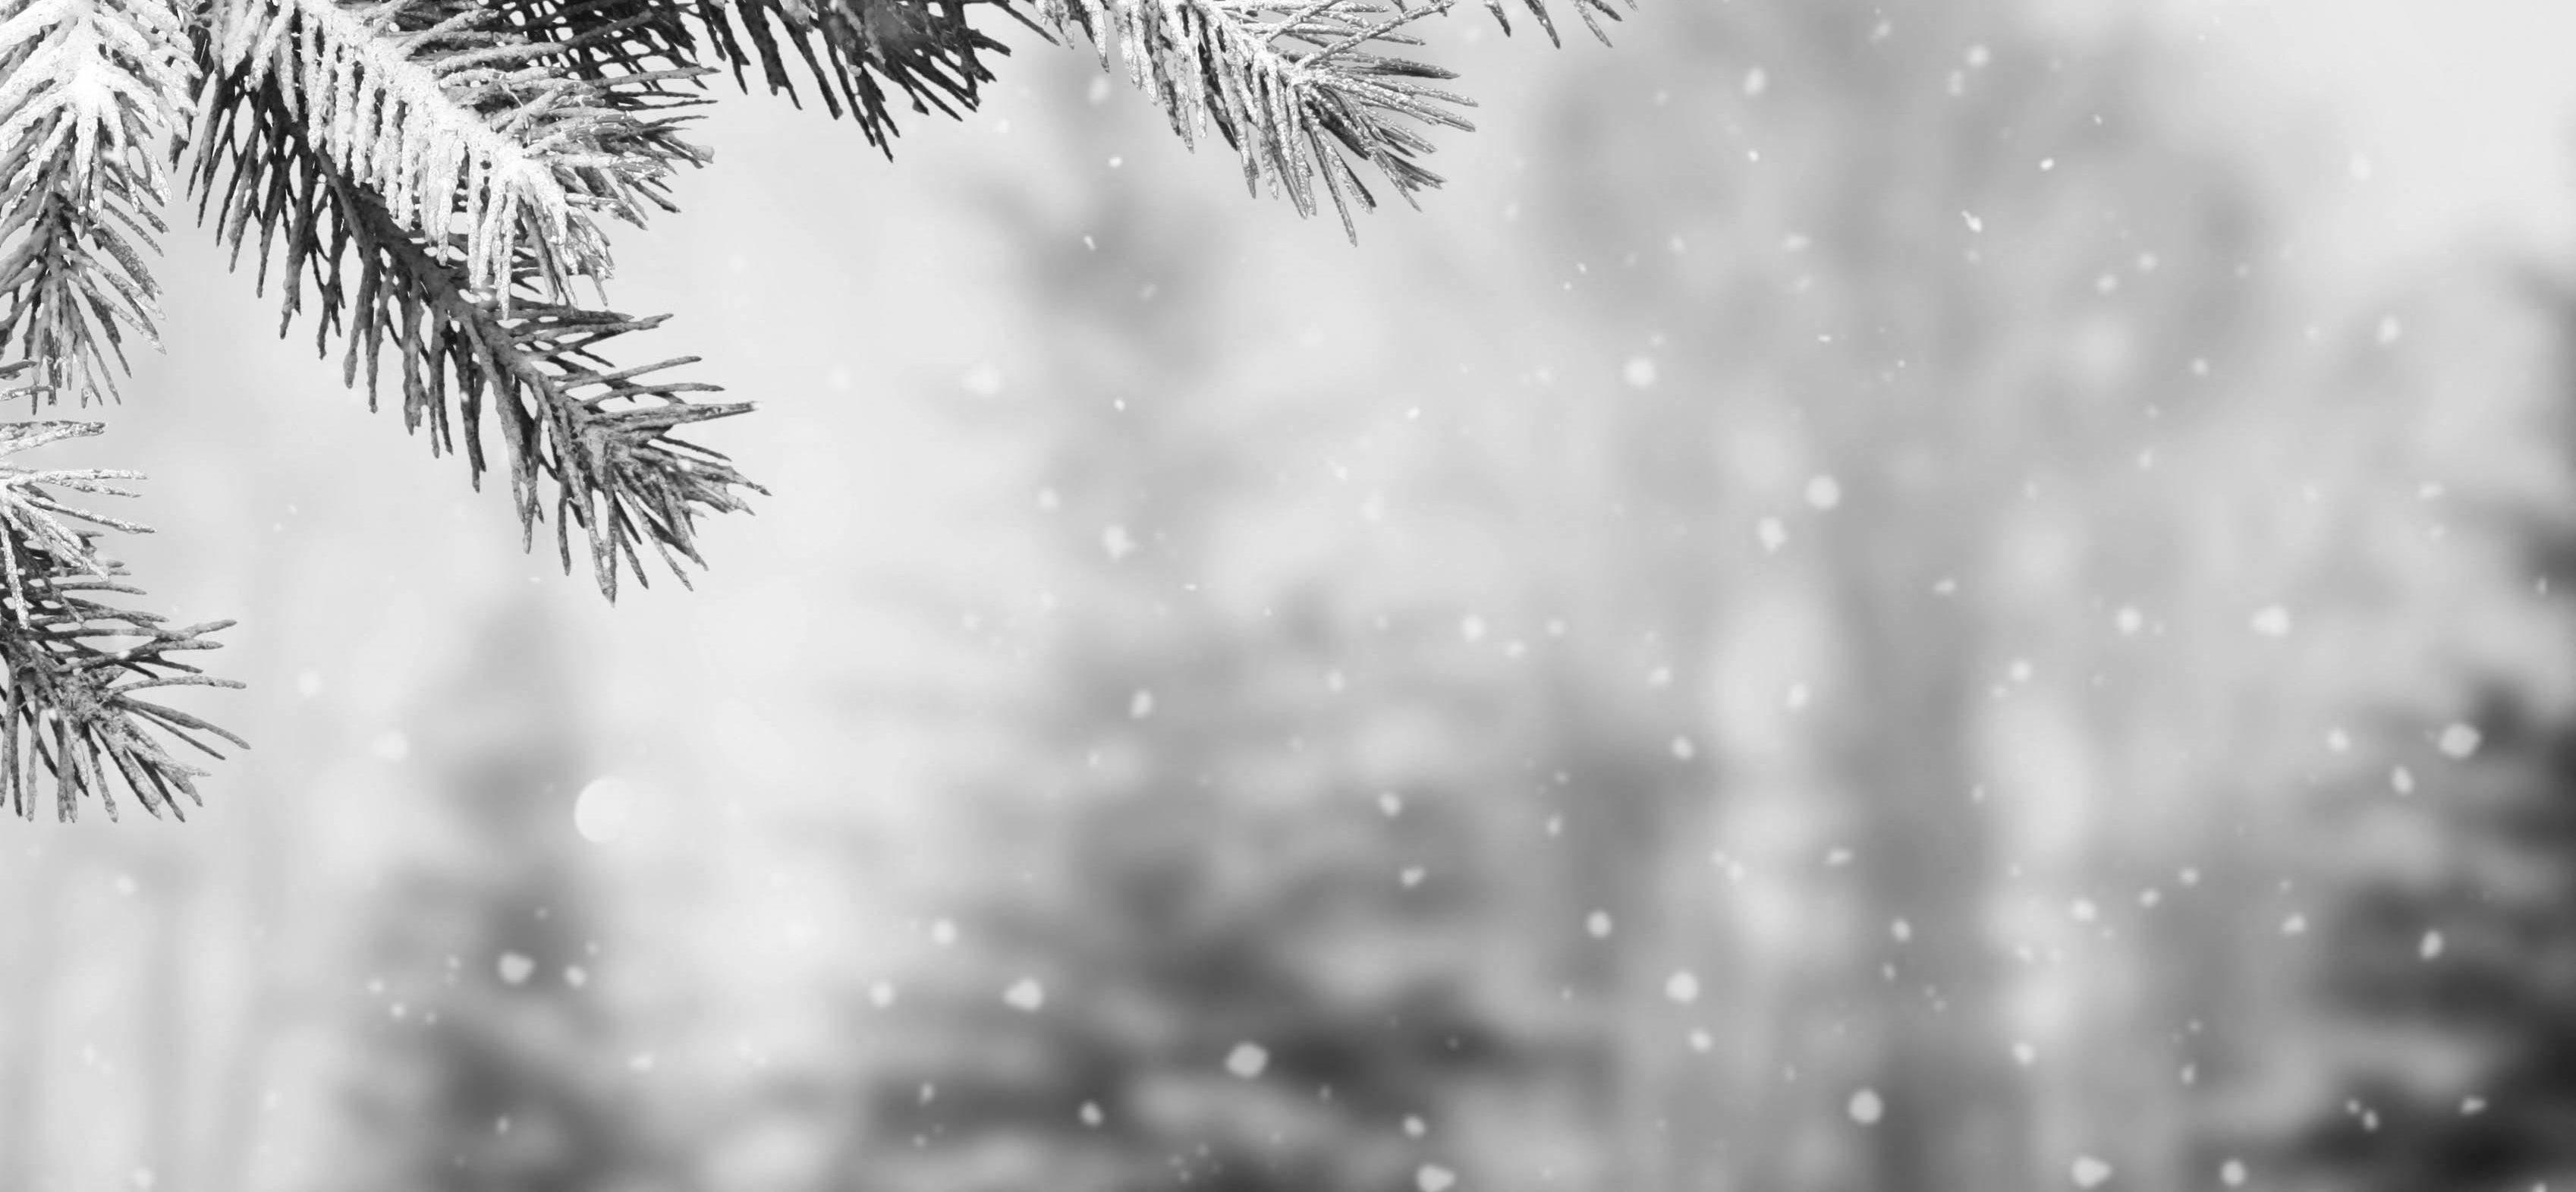 stock image- Winter